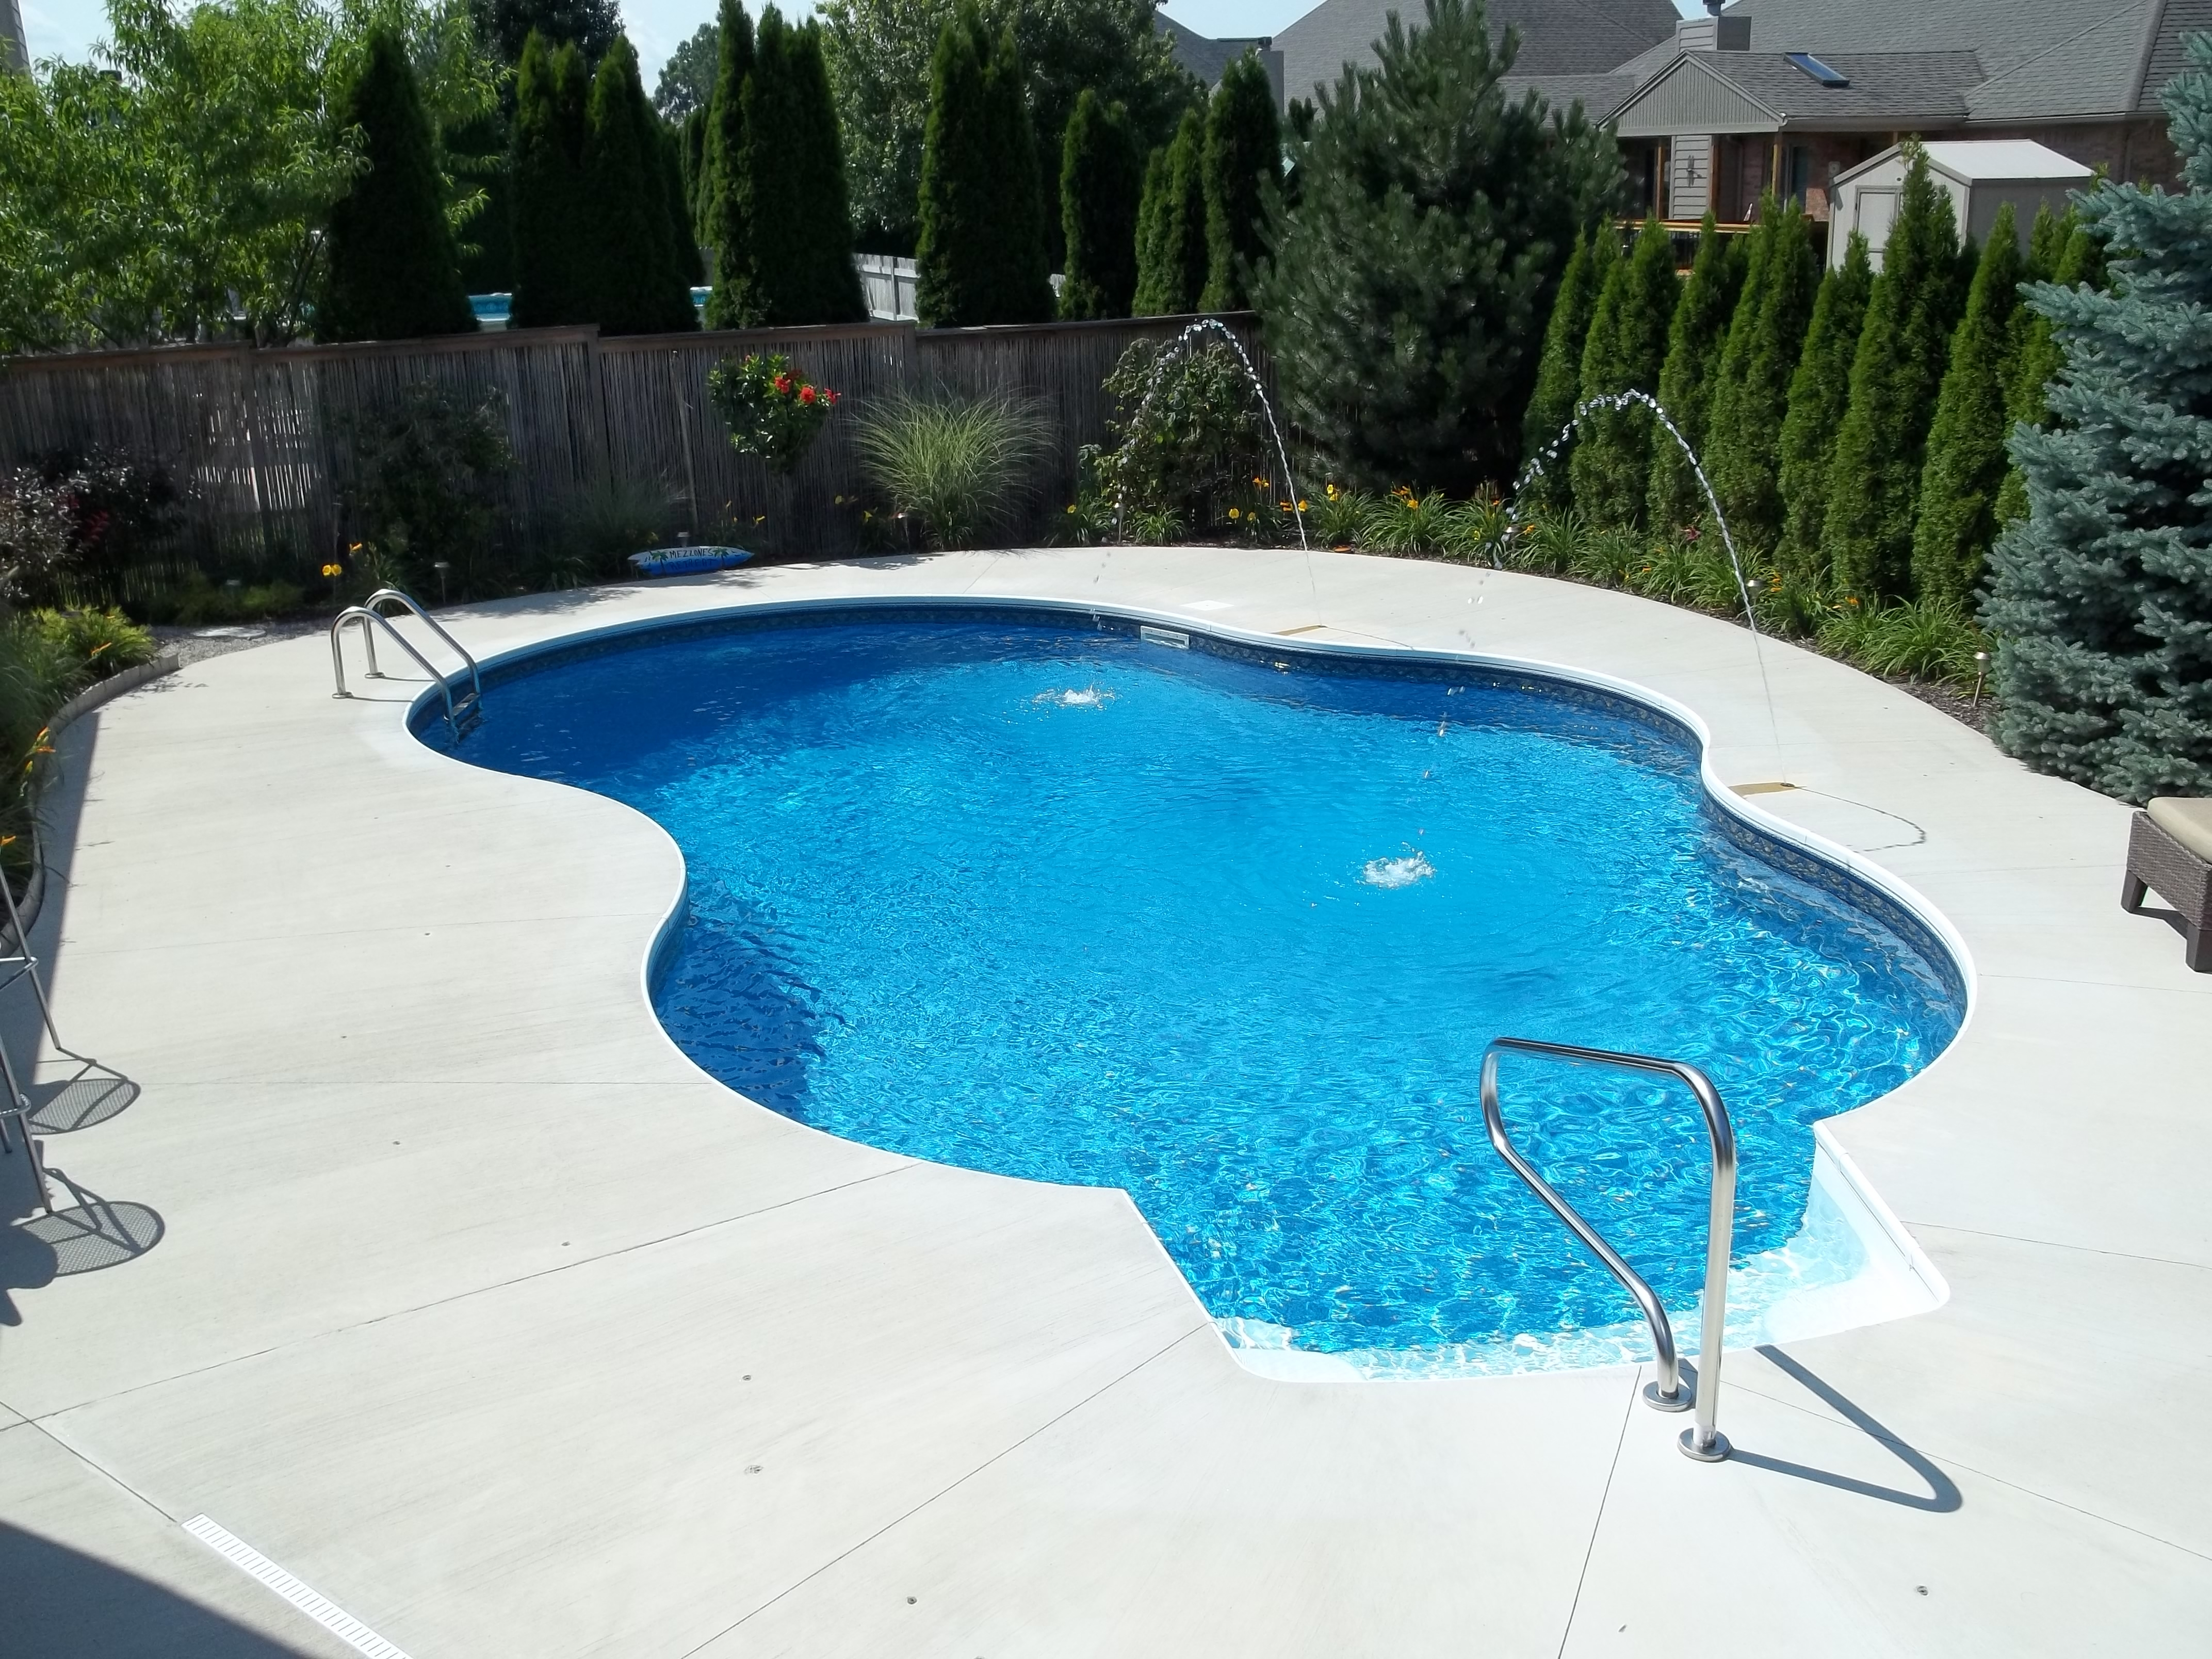 Alpine pools south hills bethel park pennsylvania for Garden hills pool hours